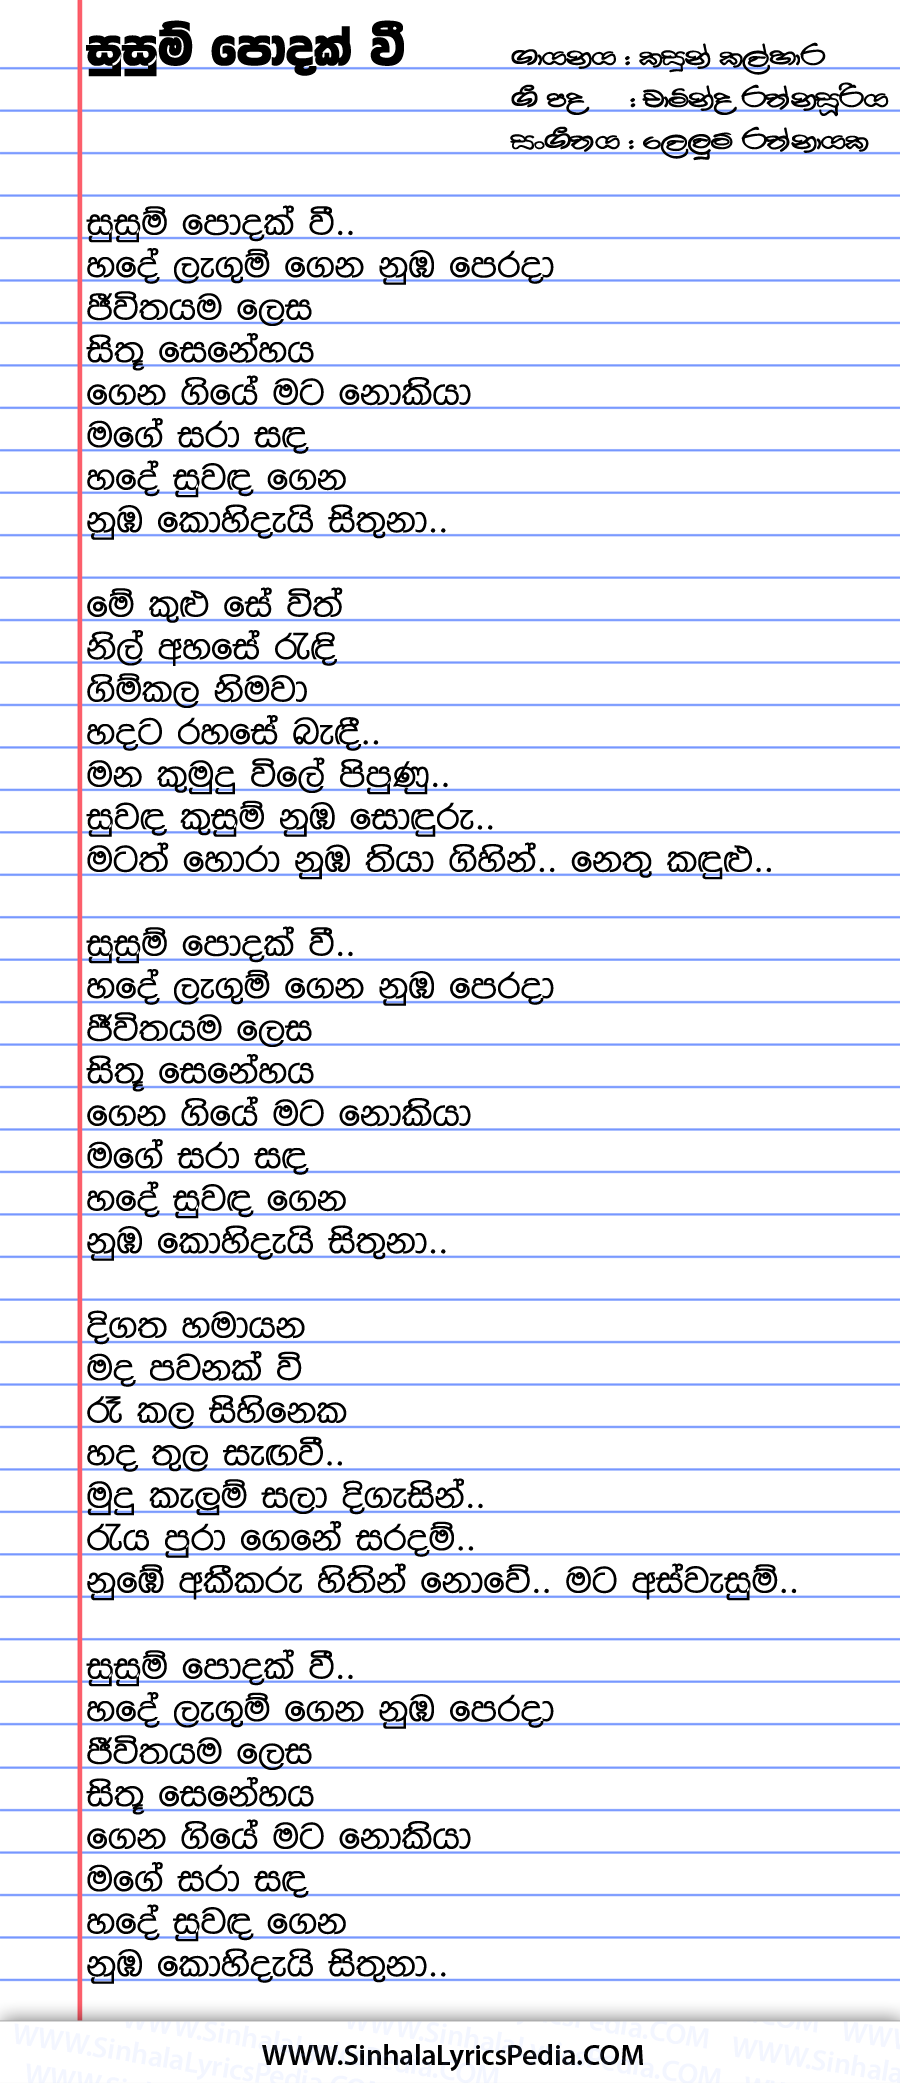 Susum Podak Wee Song Lyrics